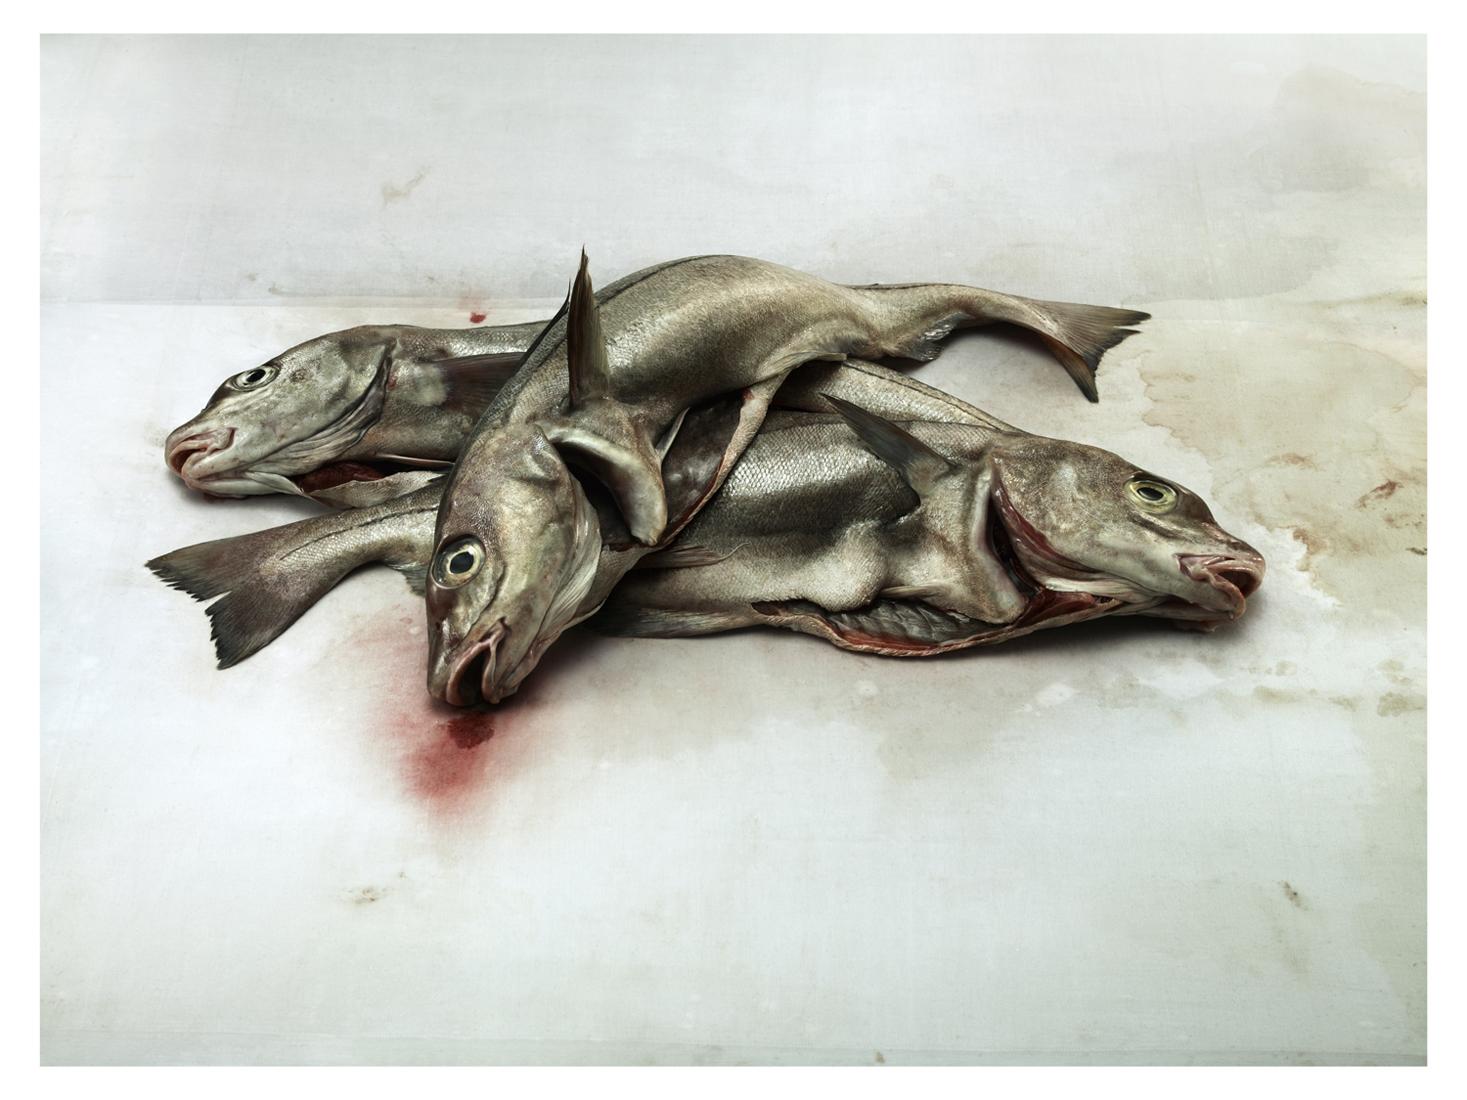 Giles Revell - Fish 2, Dave Dye